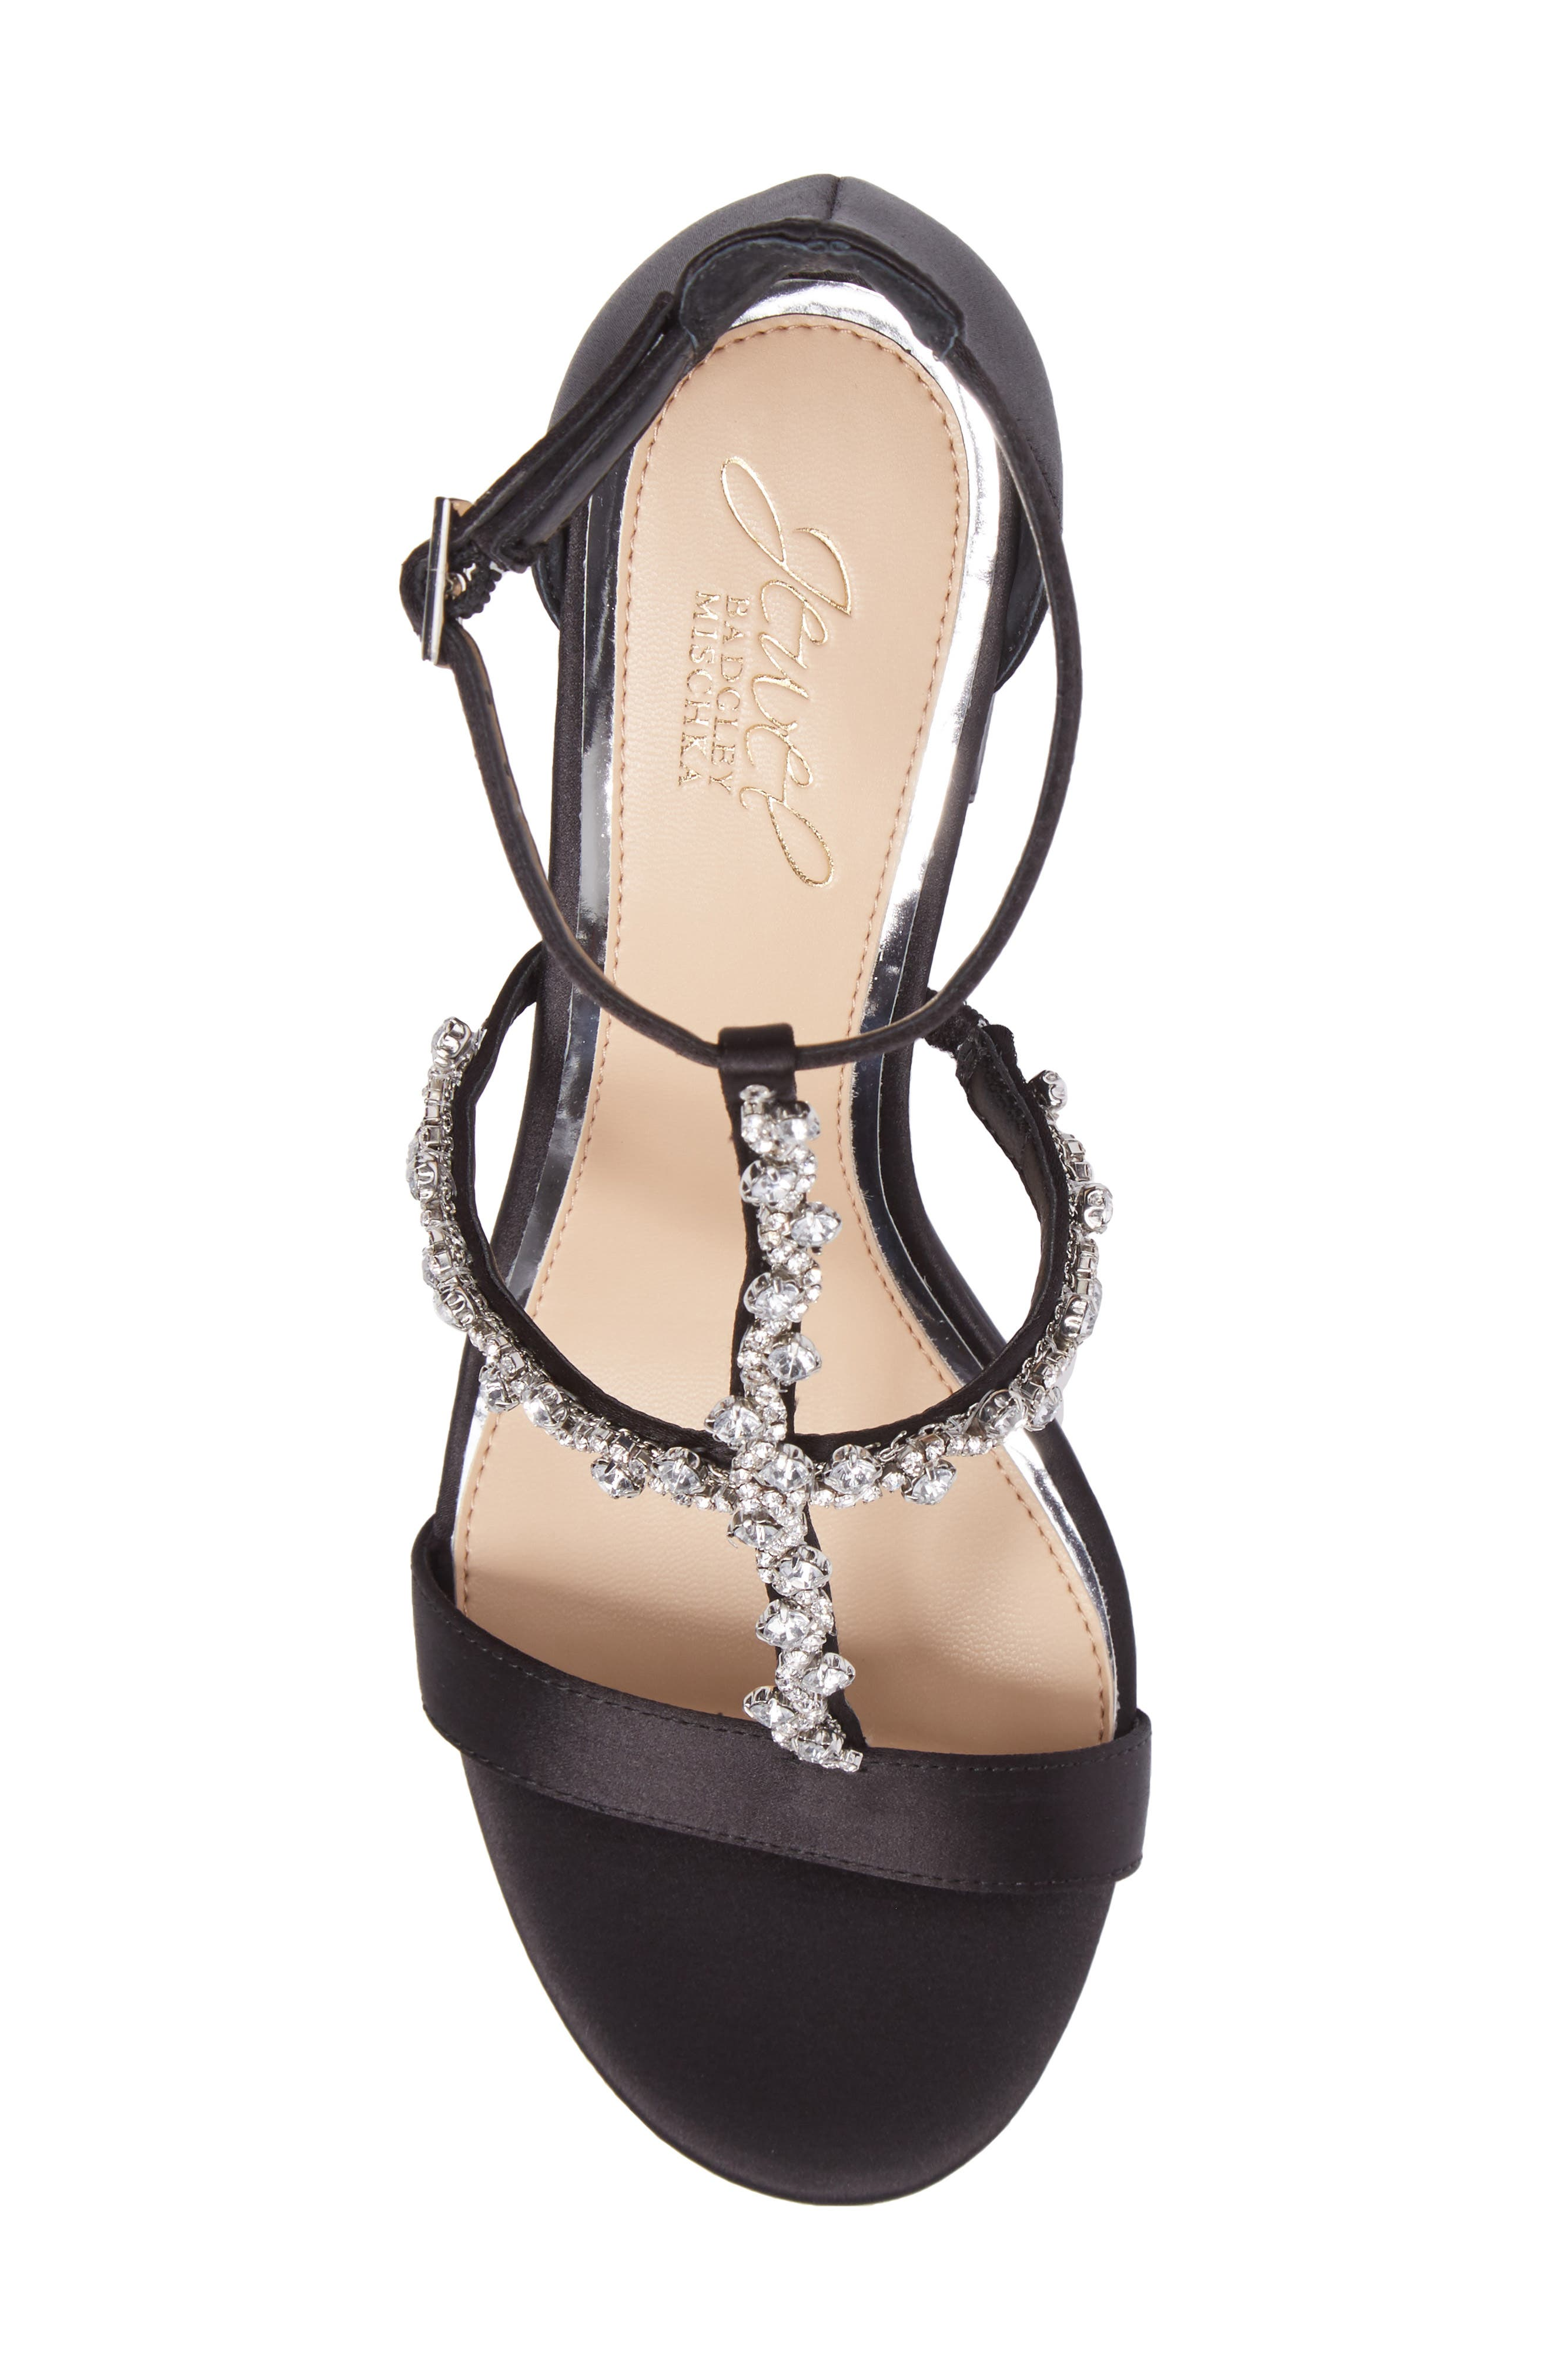 Alamea Block Heel Sandal,                             Alternate thumbnail 5, color,                             015